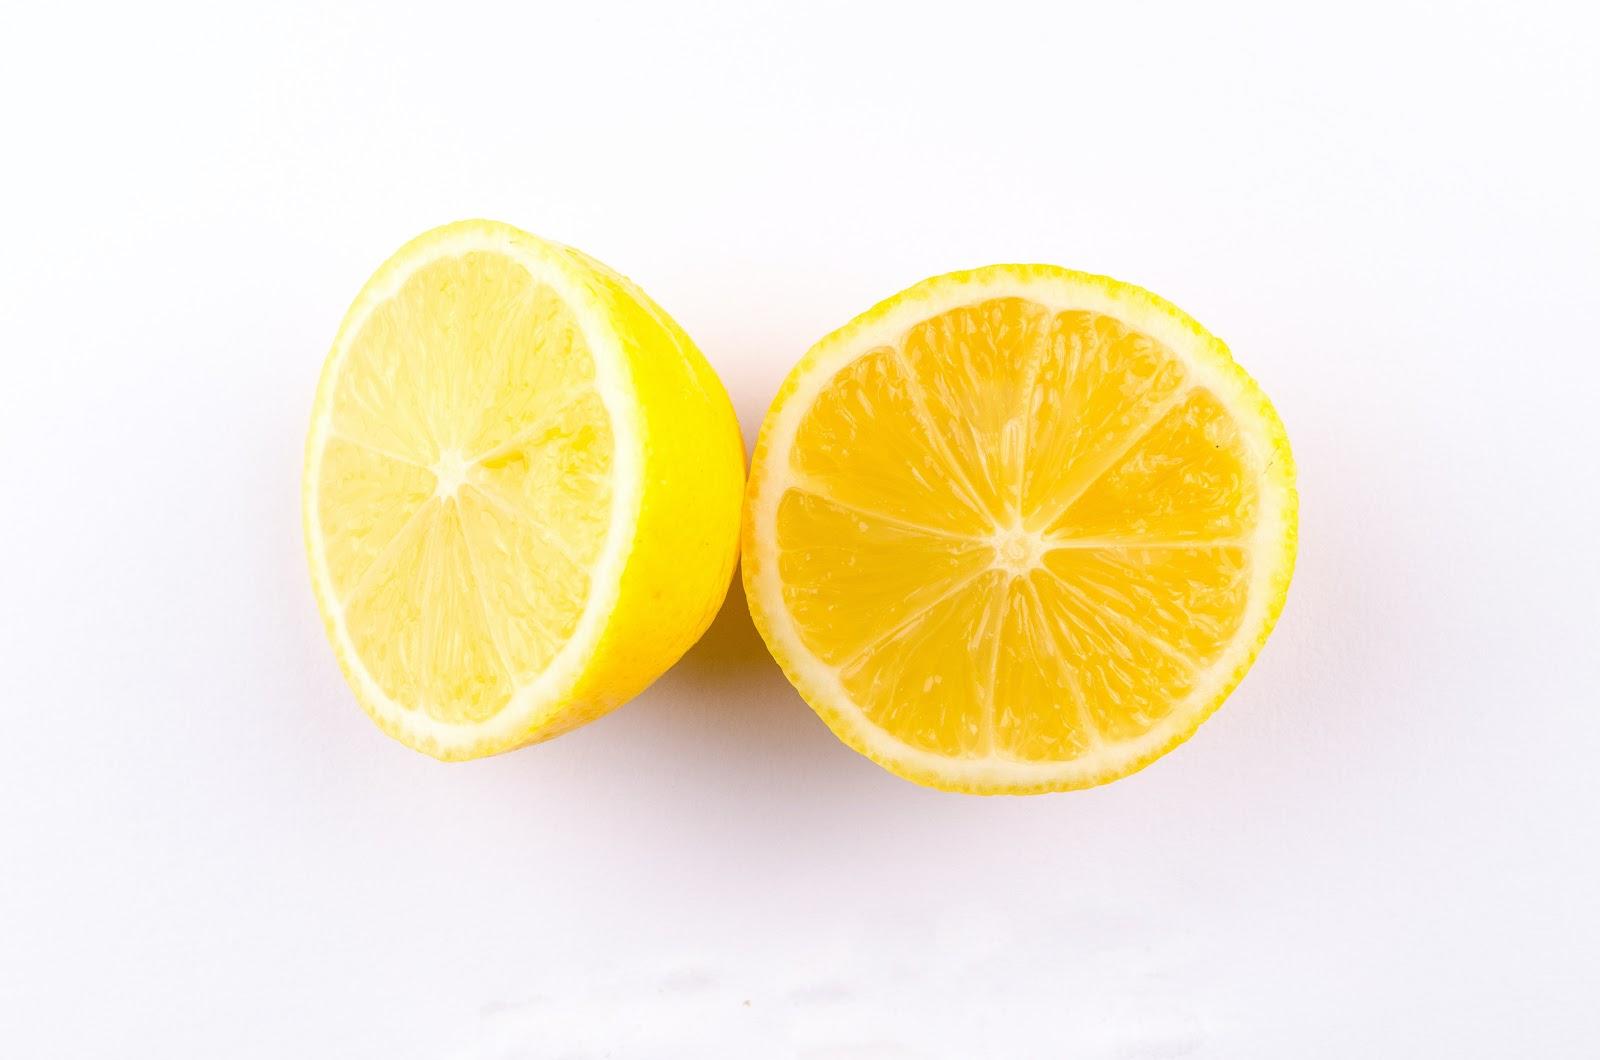 Odometer Reading for New Jersey Lemon Law